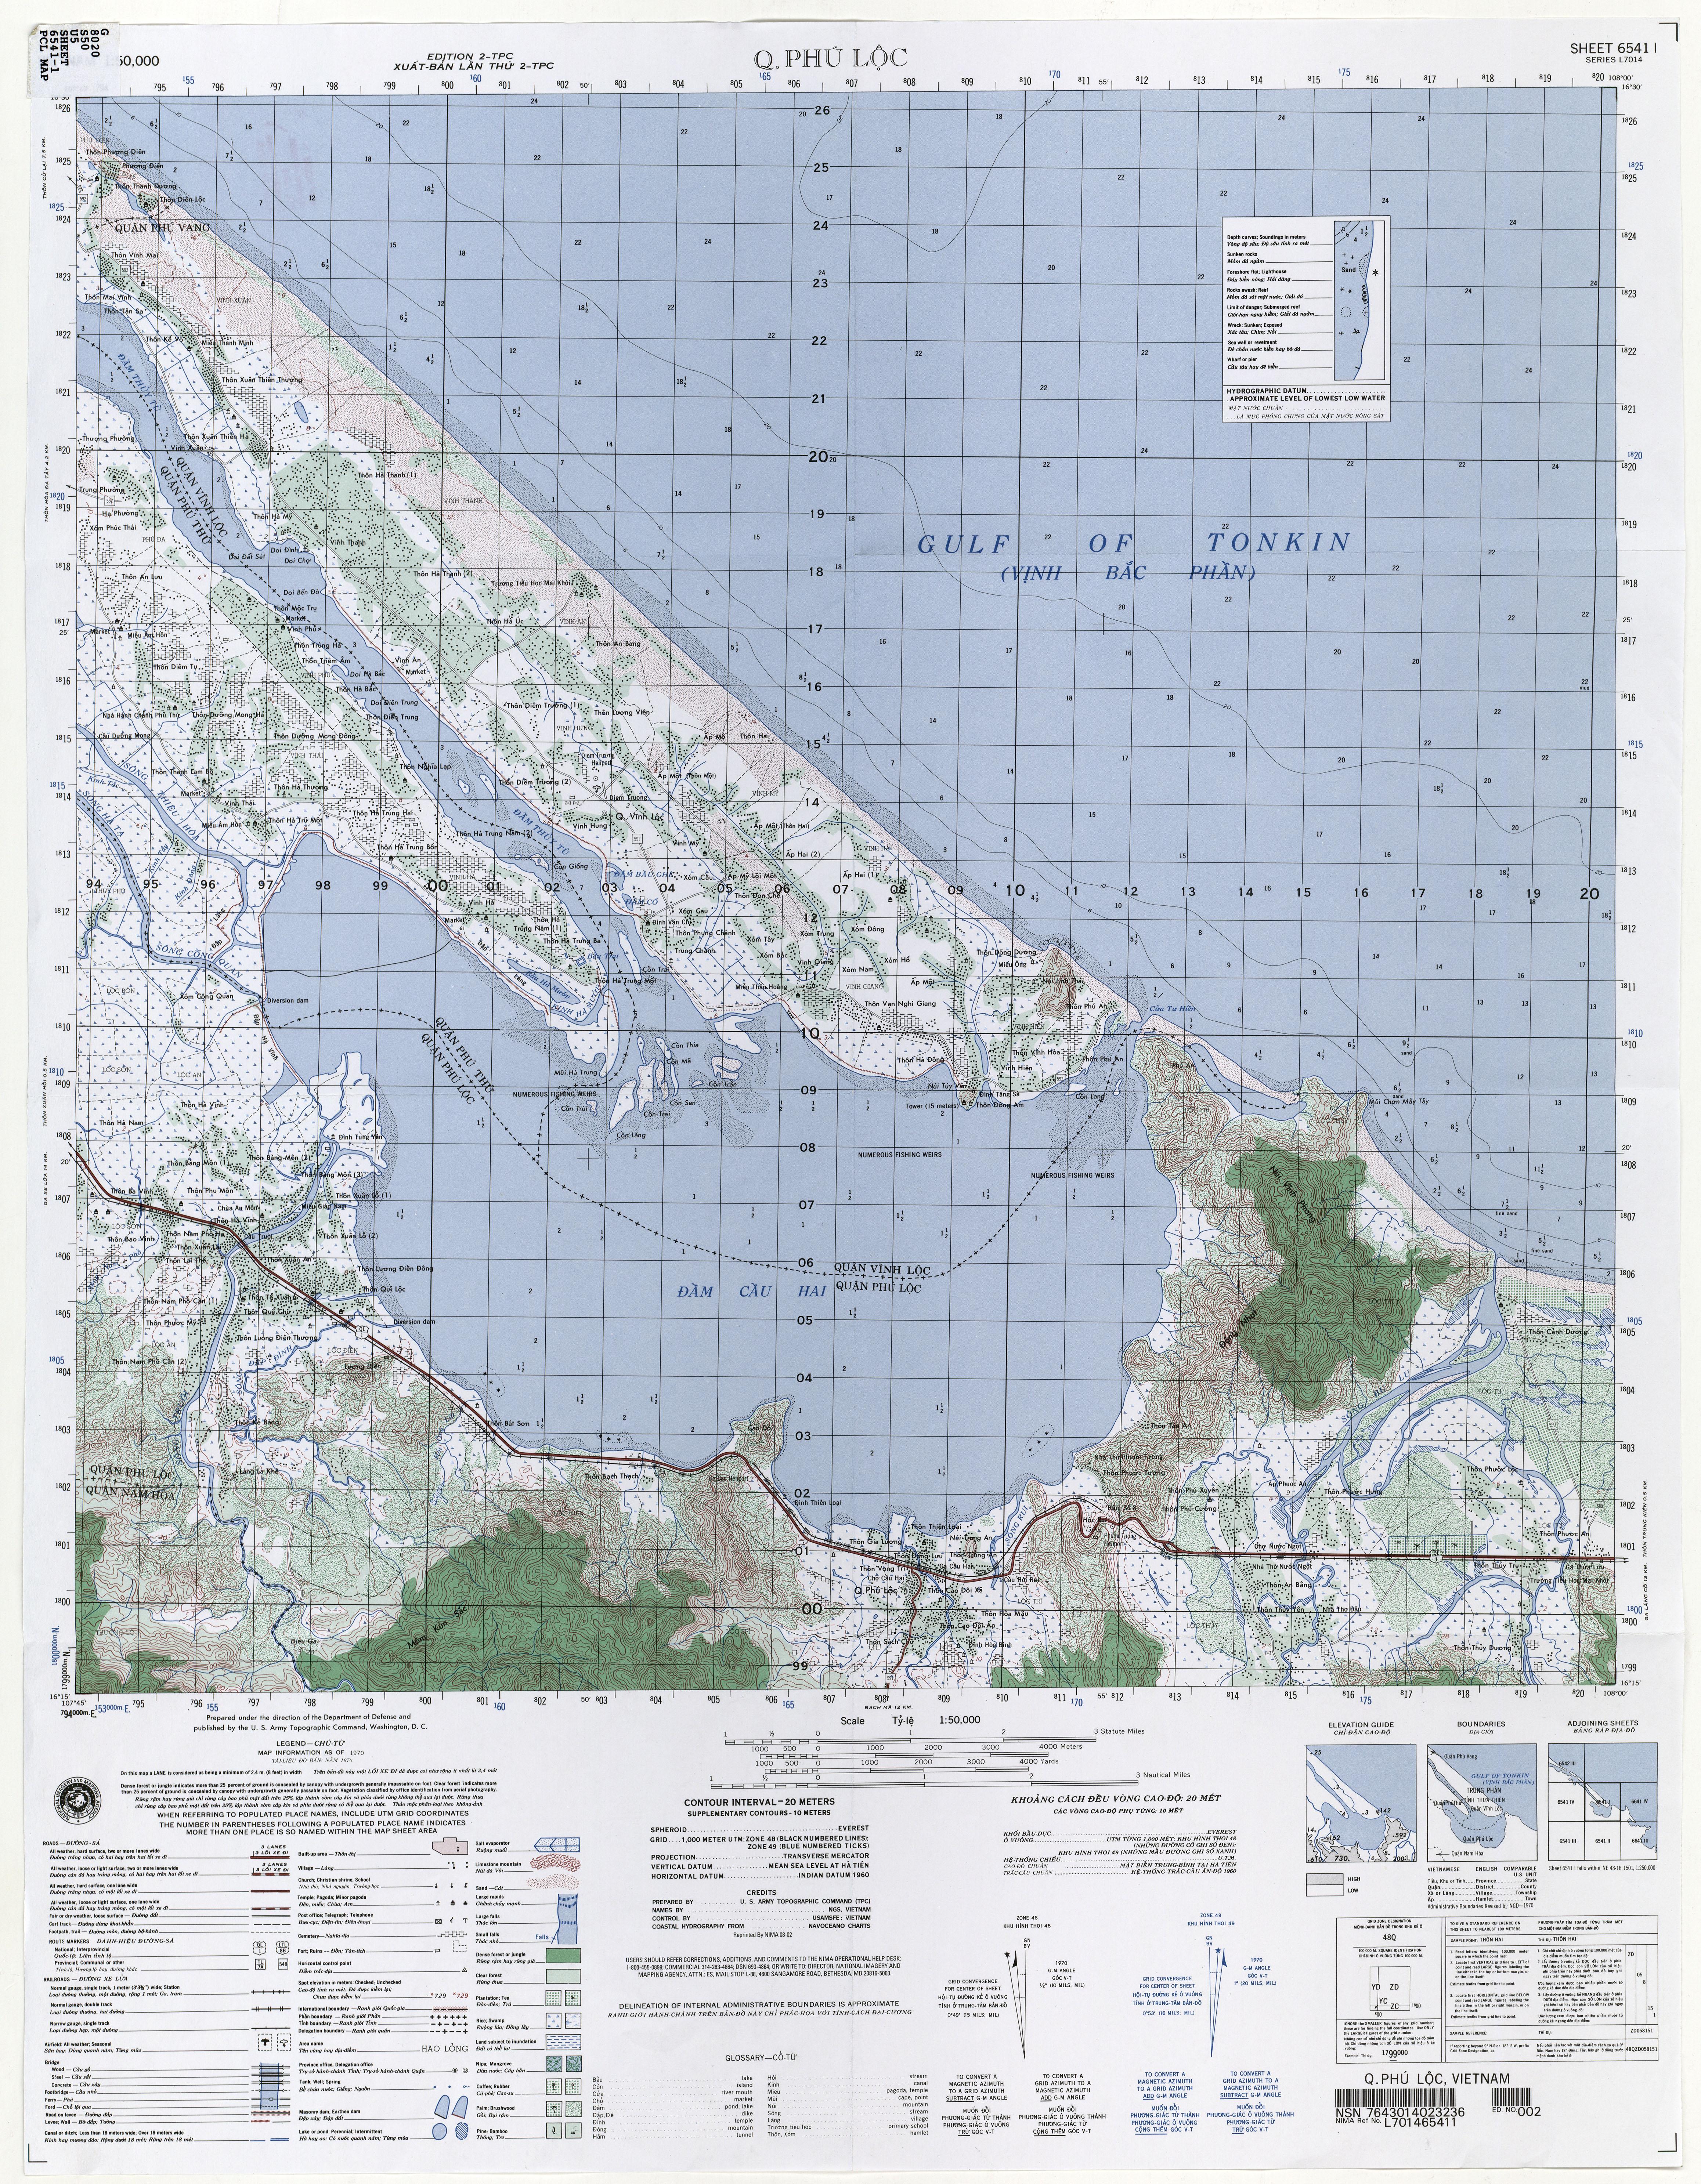 Vietnam Topographic Maps PerryCasta eda Map Collection UT – Map Us Bases Vietnam 1970